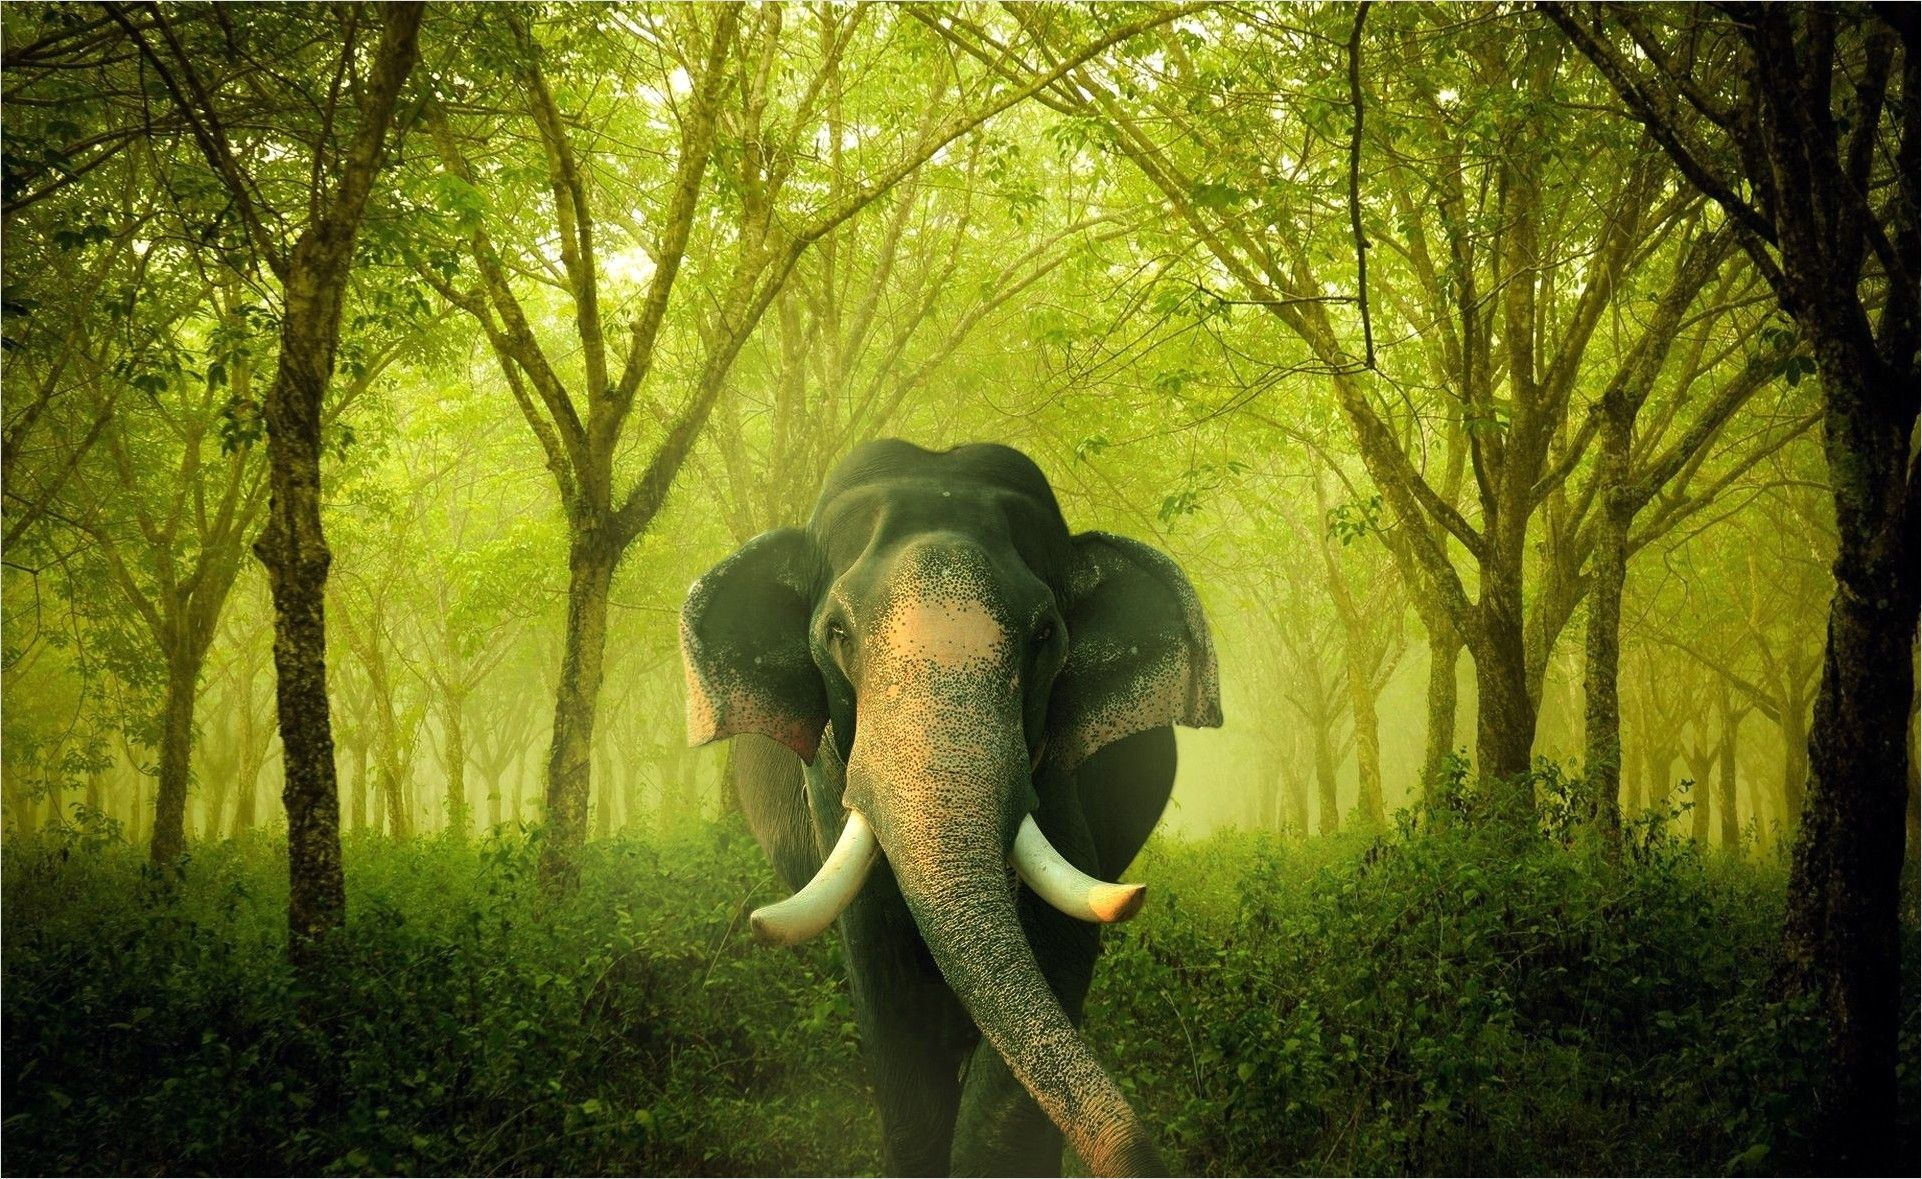 Kerala Elephant Wallpaper Hd 4k - Top Wallpaper HD